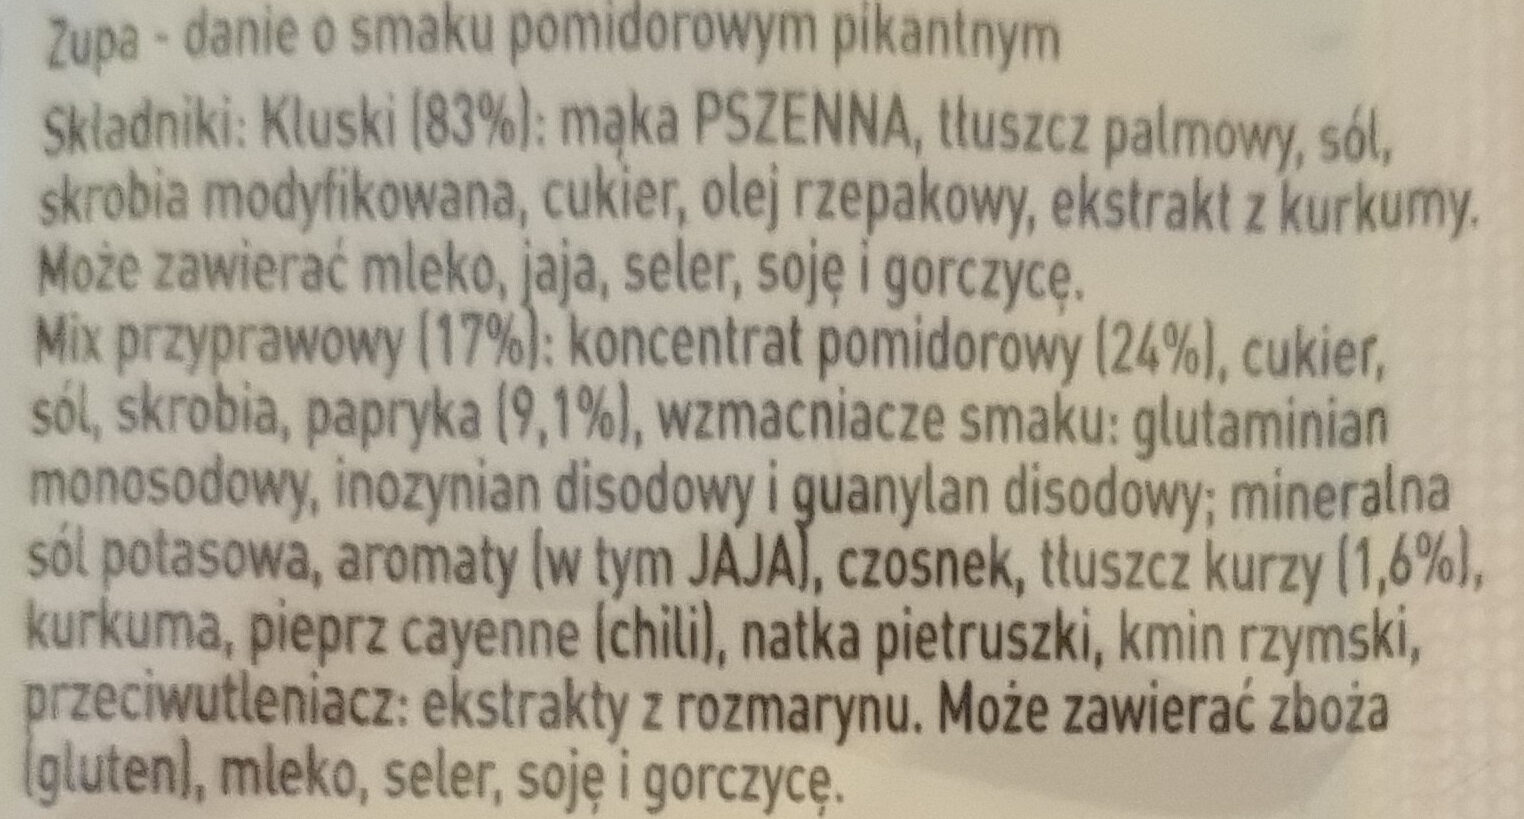 Nudle Pomidorowe pikantne - Ingrediënten - pl